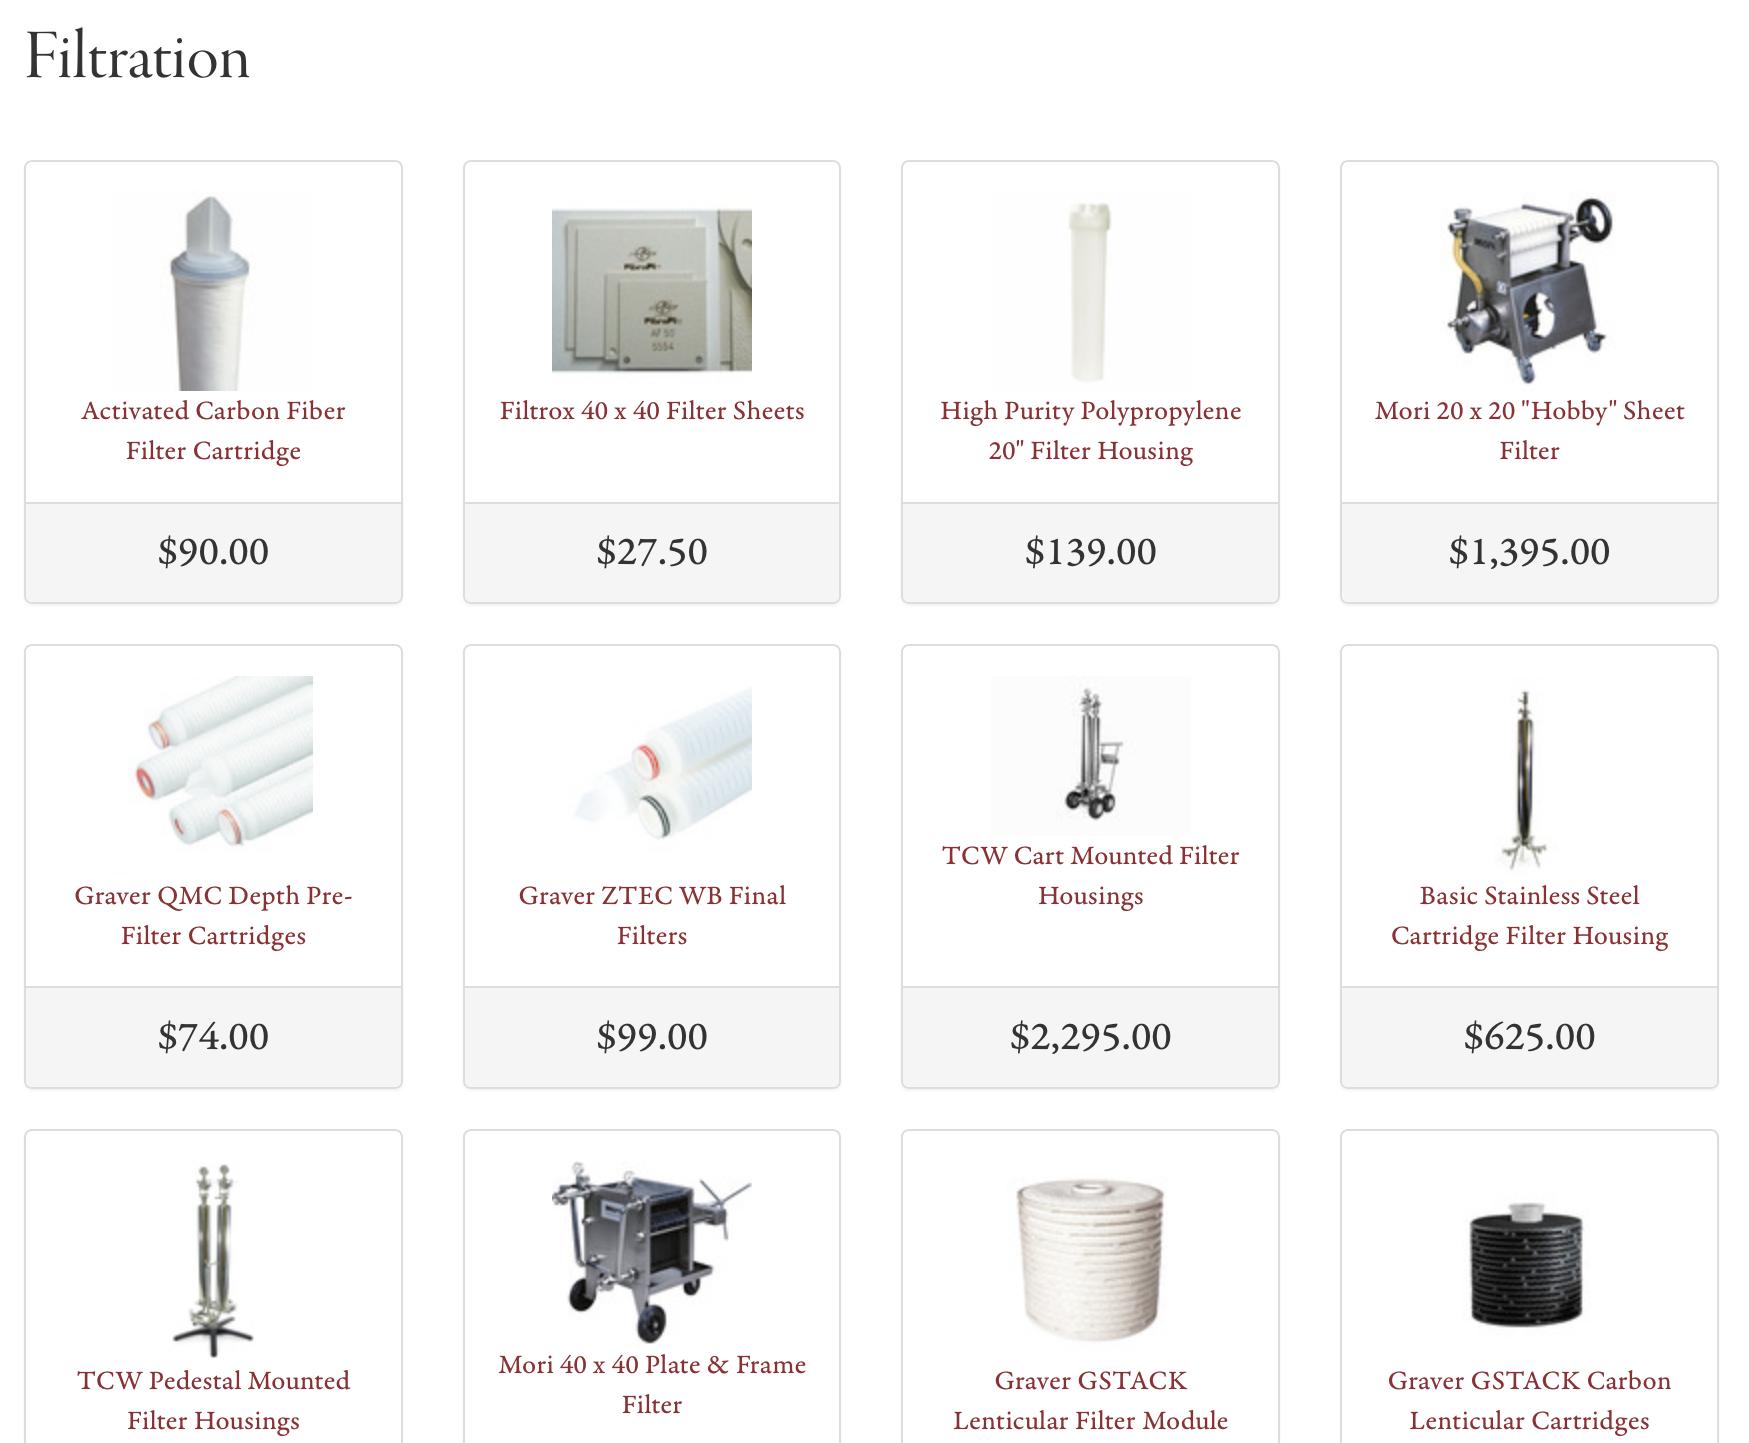 Screenshot_2019-01-07 Categories - Filtration - TCW Equipment Store.png